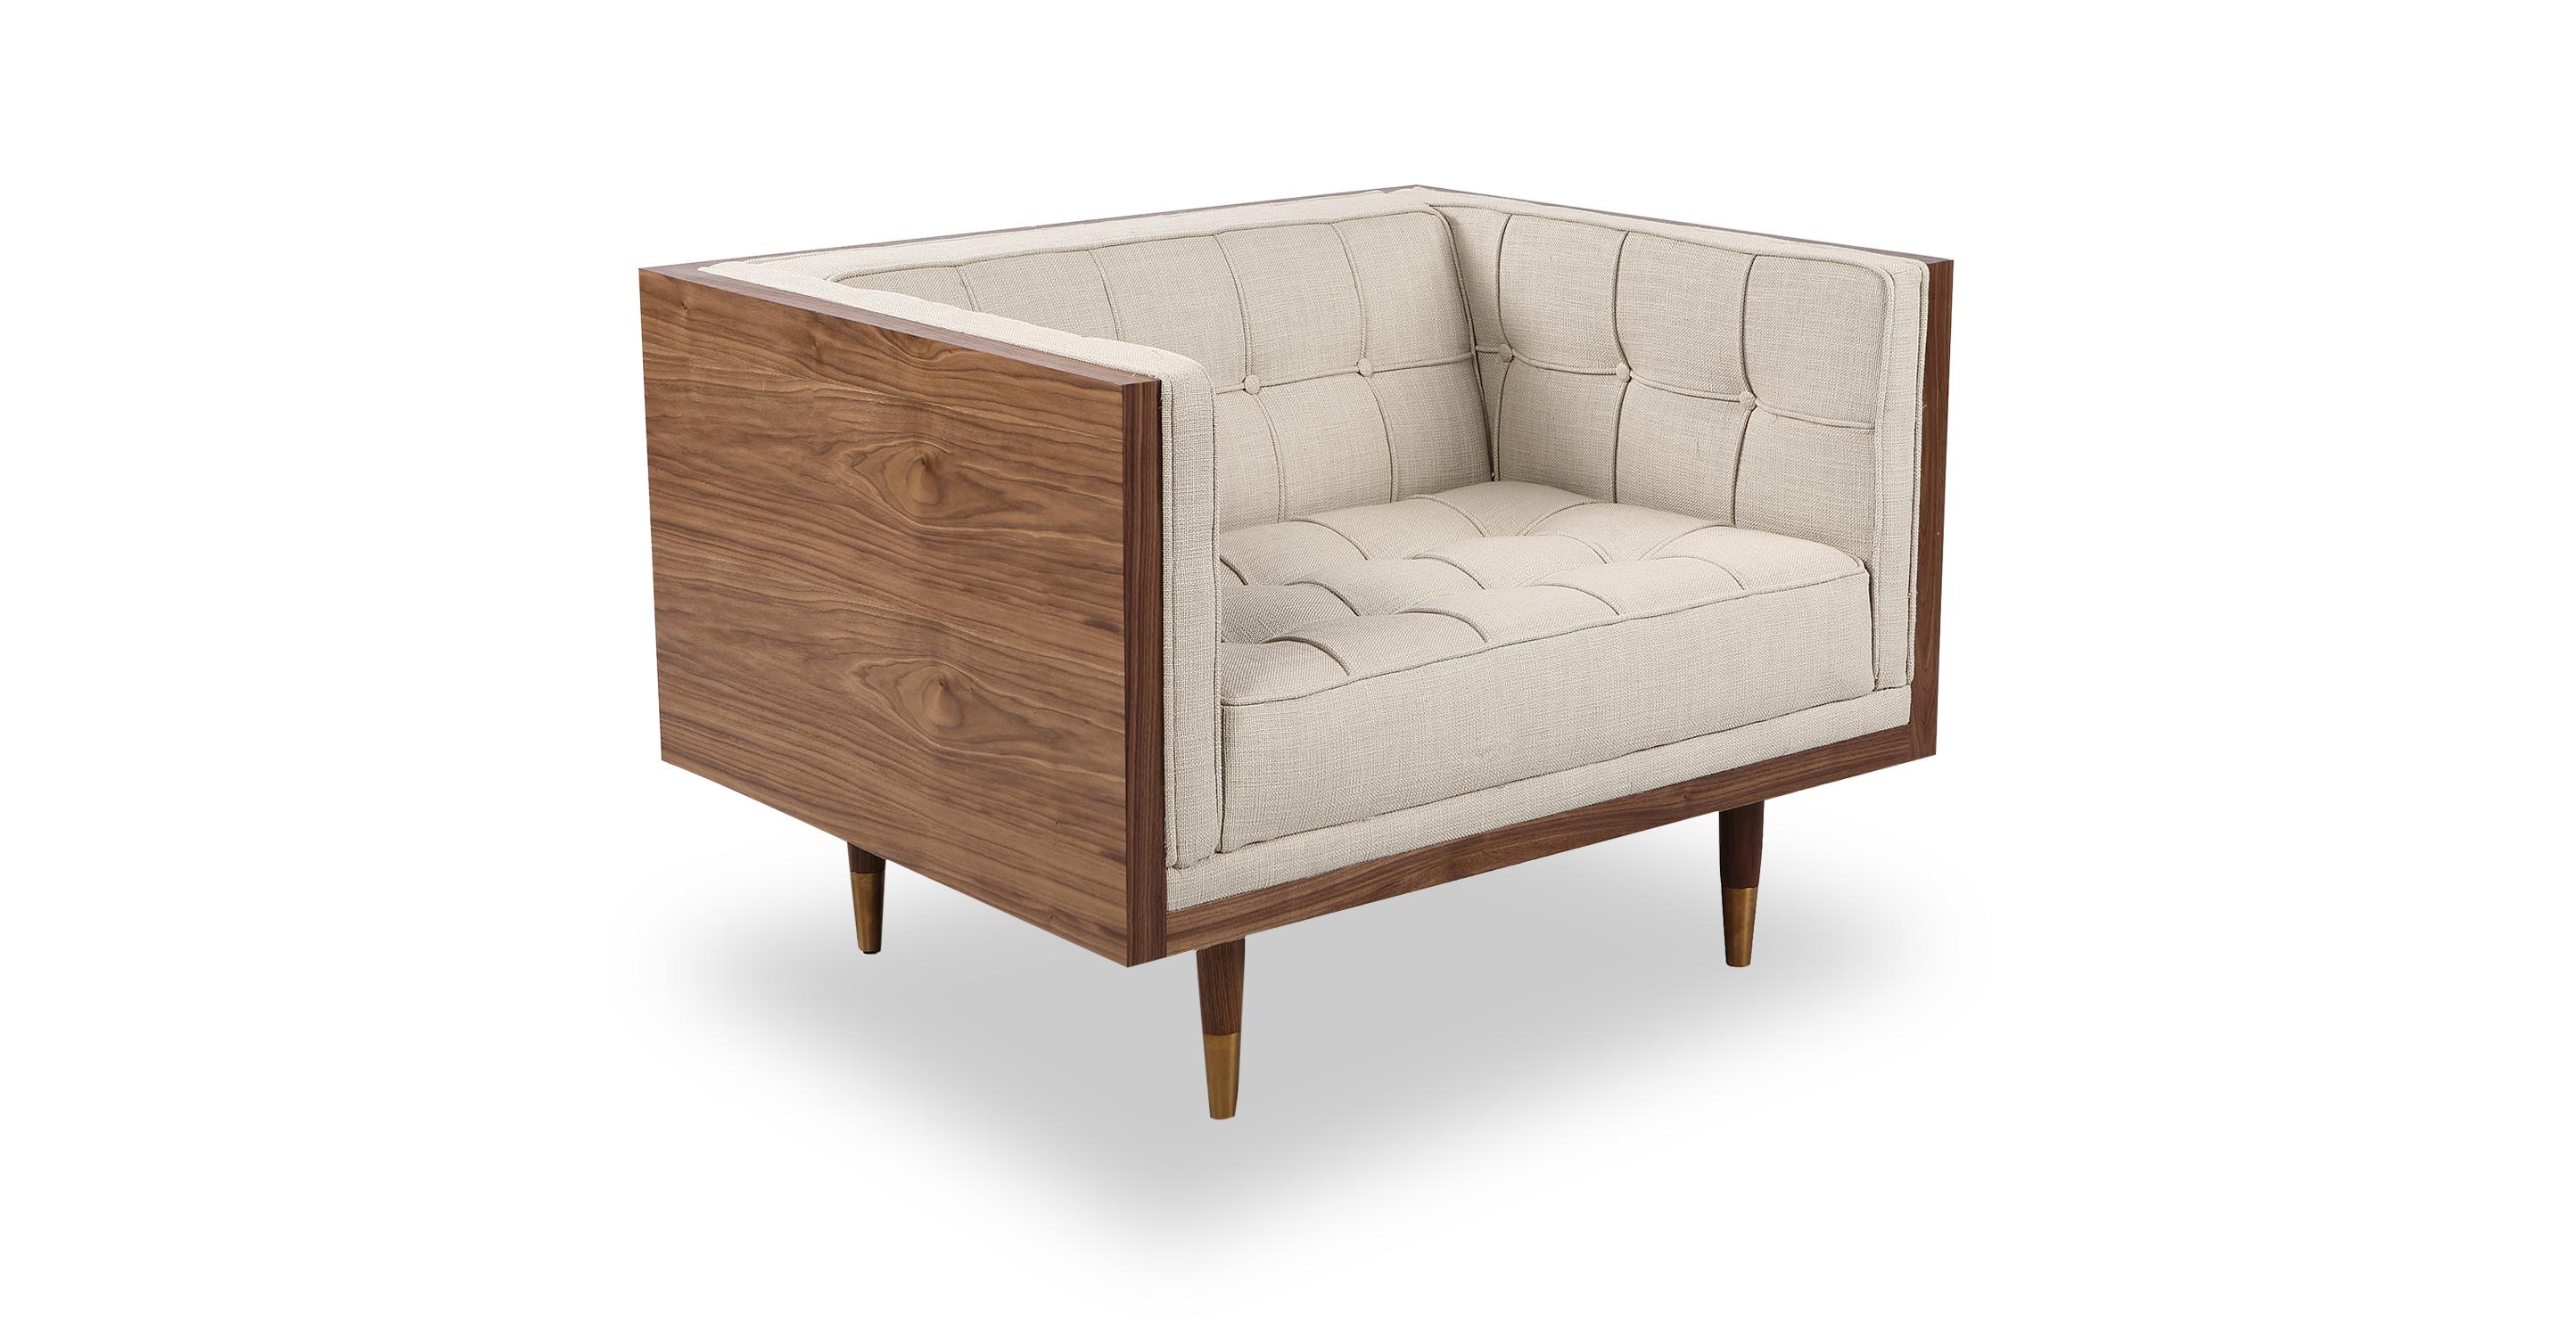 Woodrow Box Fabric Chair, Walnut/Urban Hemp